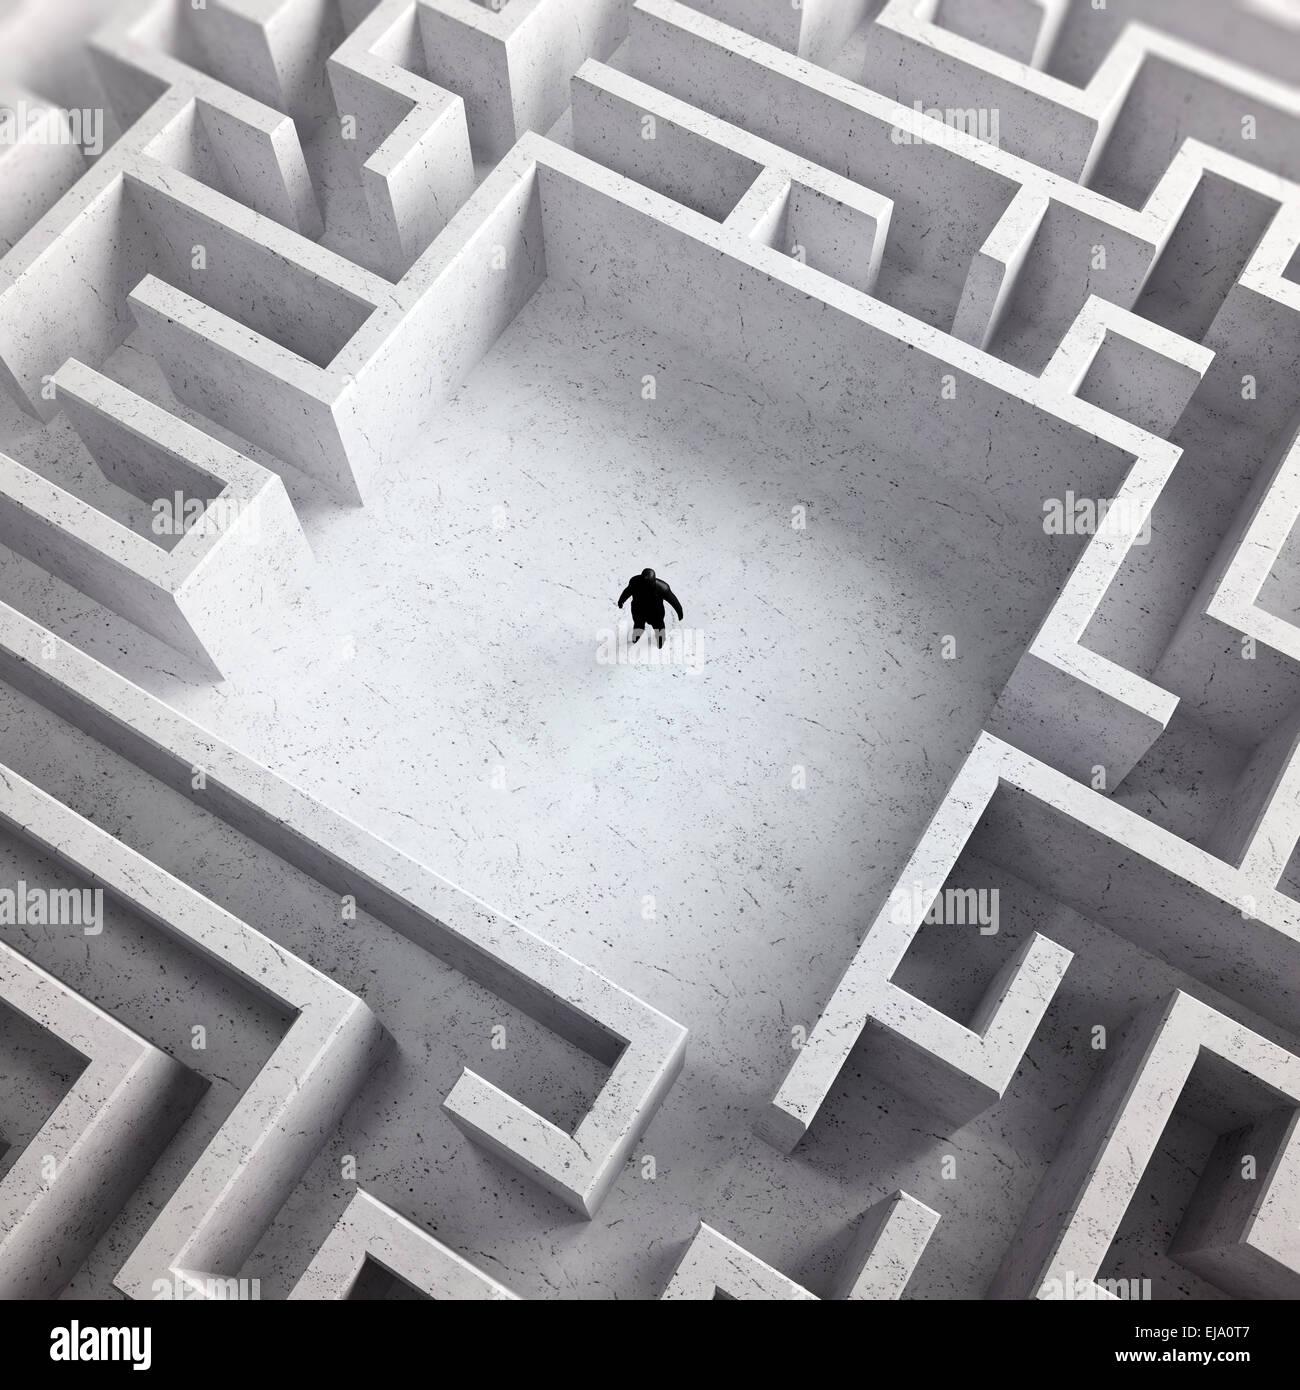 Tiny man inside an endless maze - Stock Image